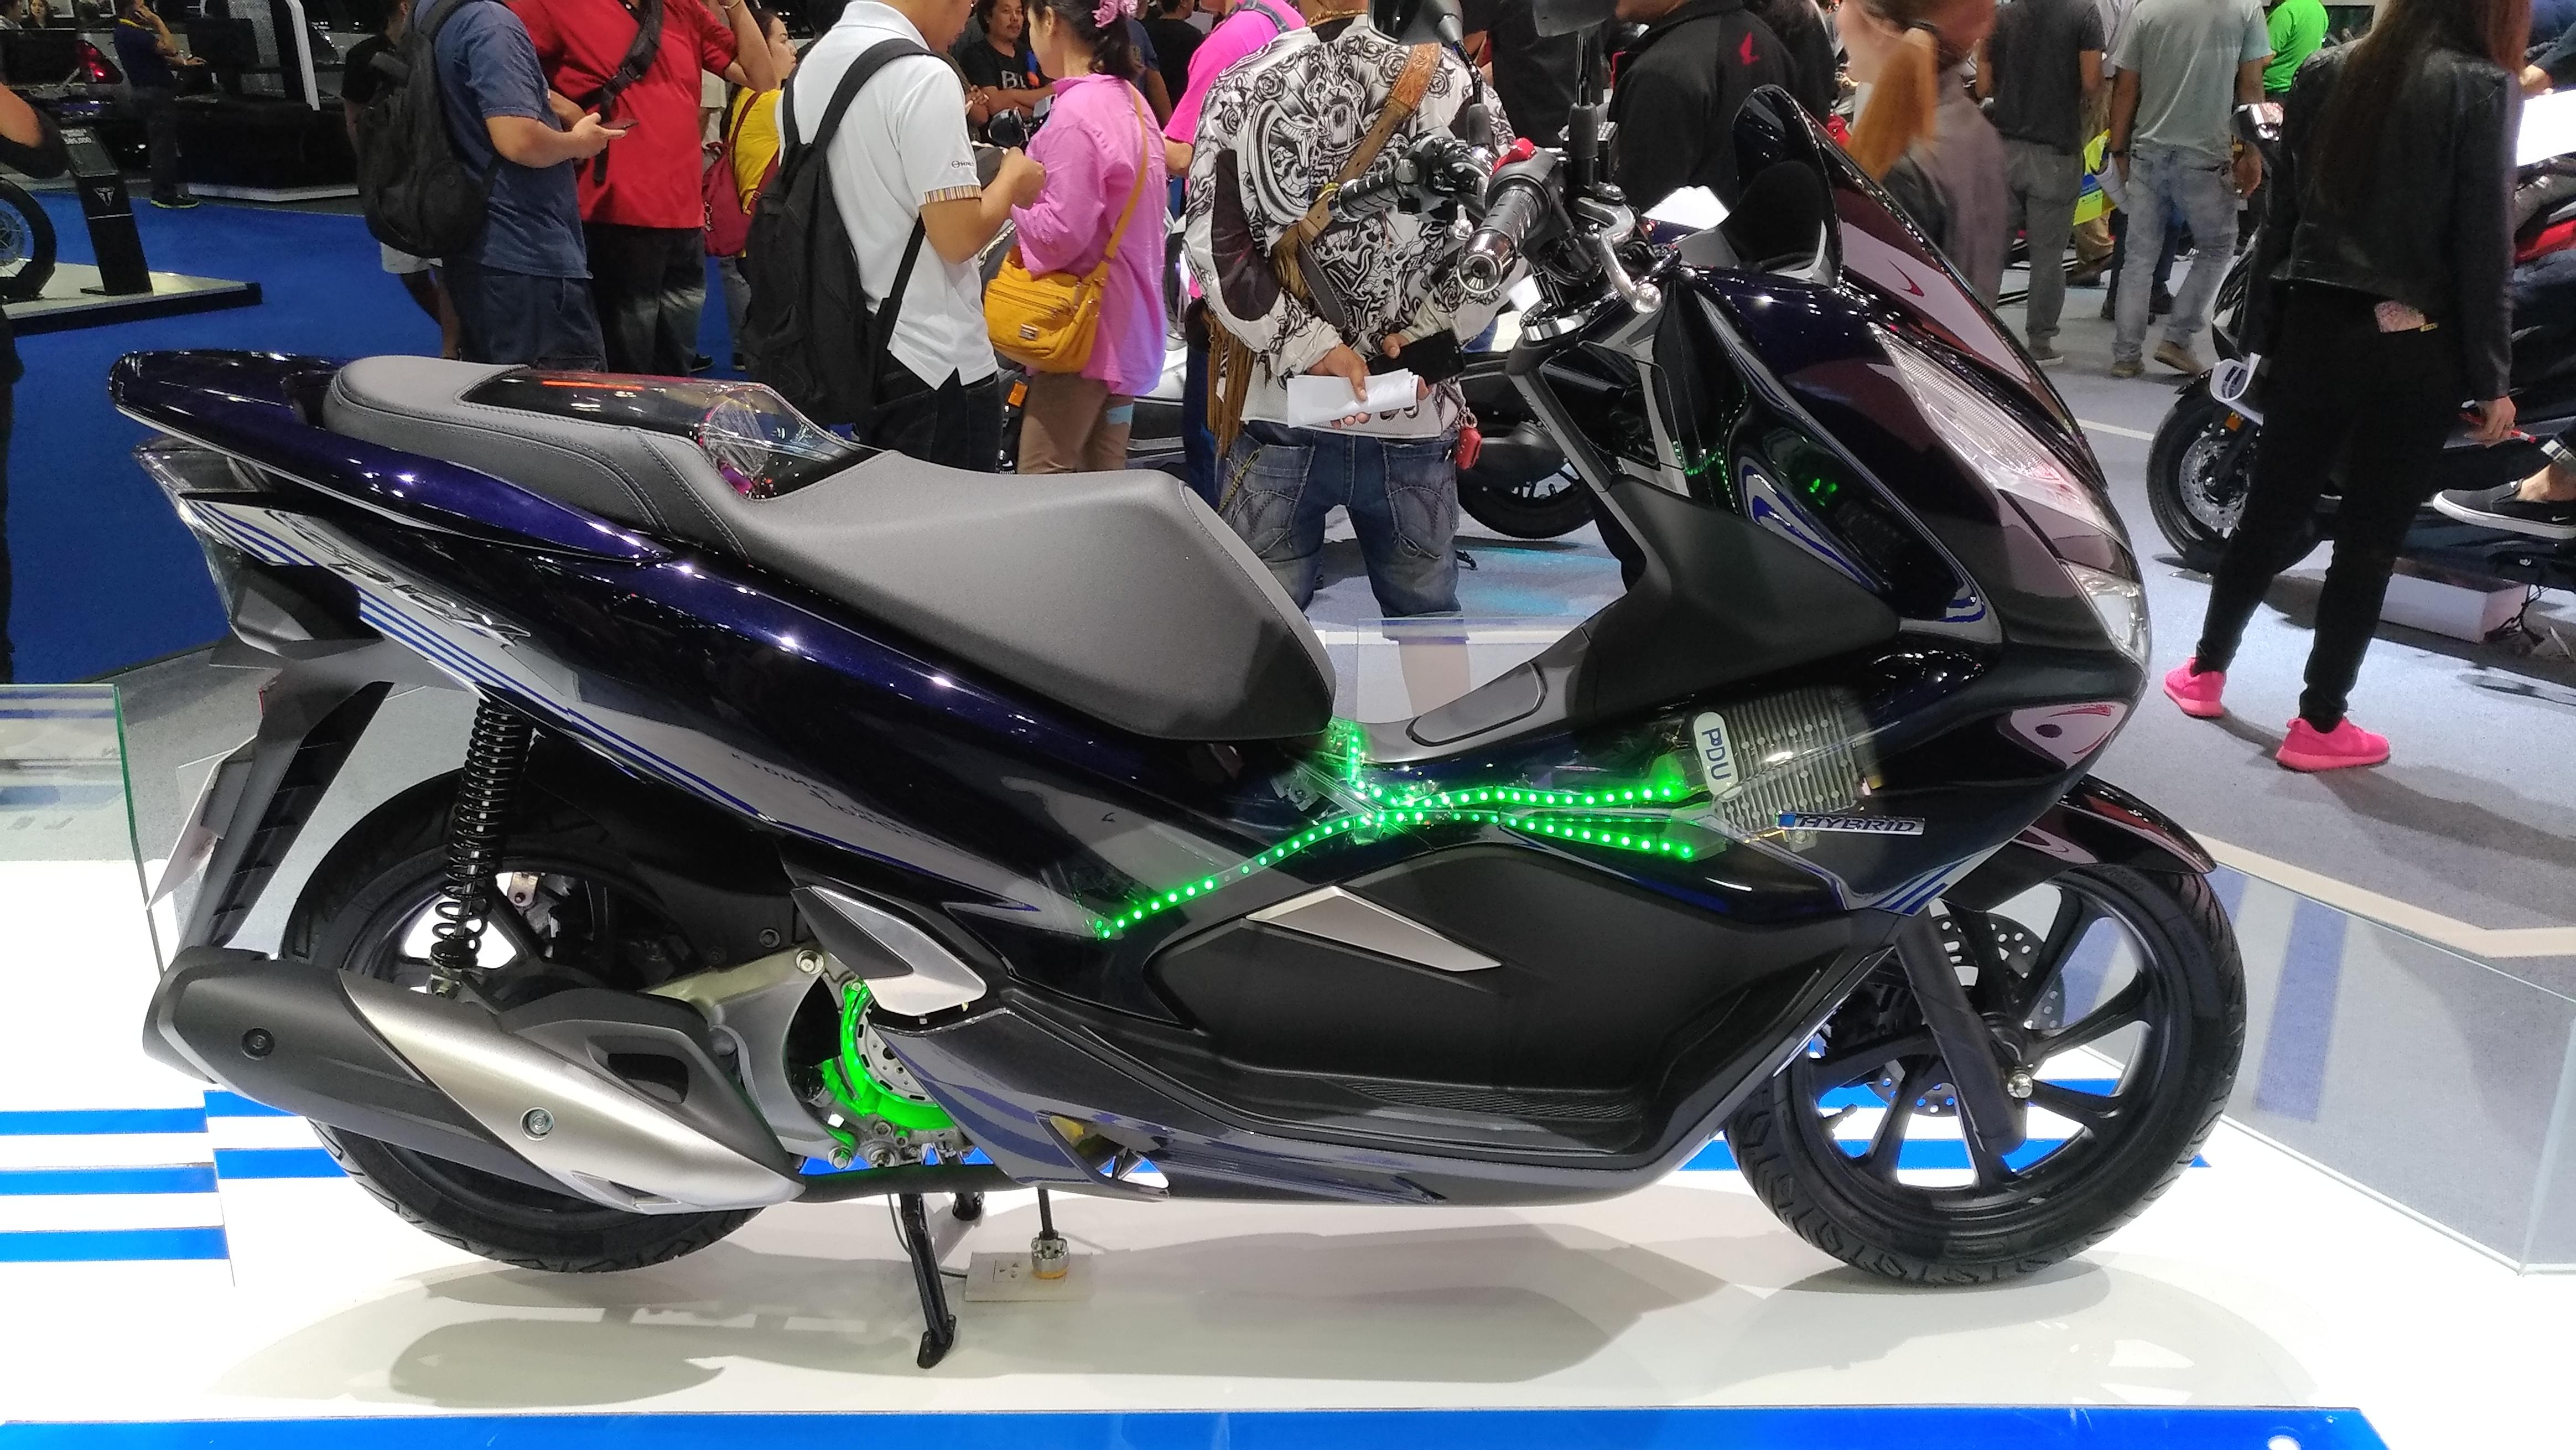 honda motorcycles thailand pcx. Black Bedroom Furniture Sets. Home Design Ideas